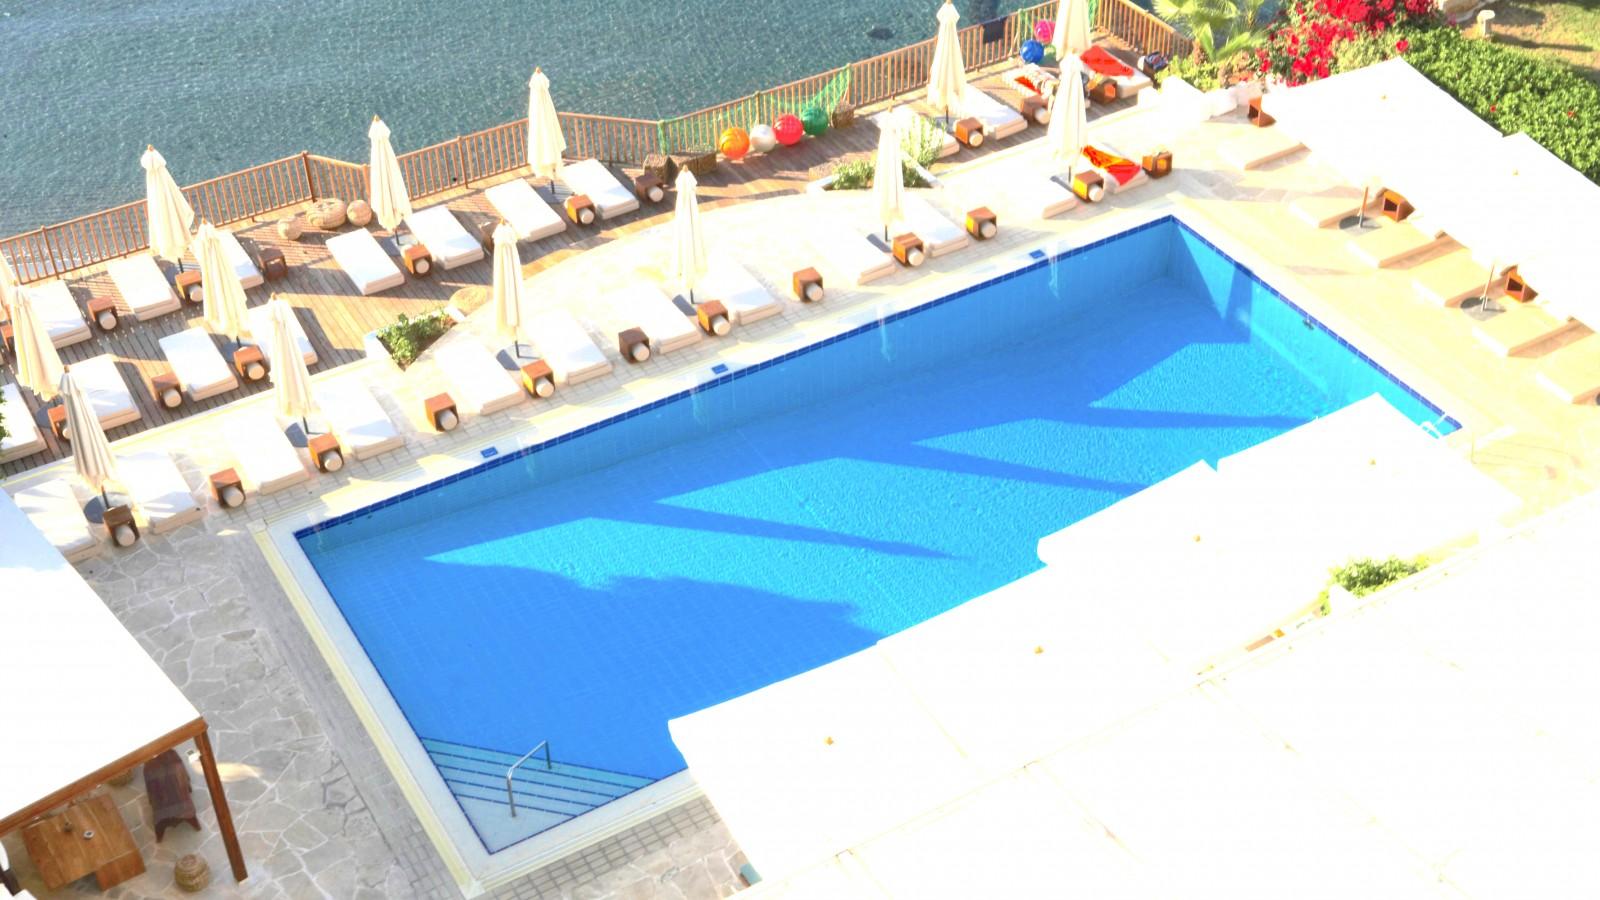 Londa Hotel pool area - aerial shot